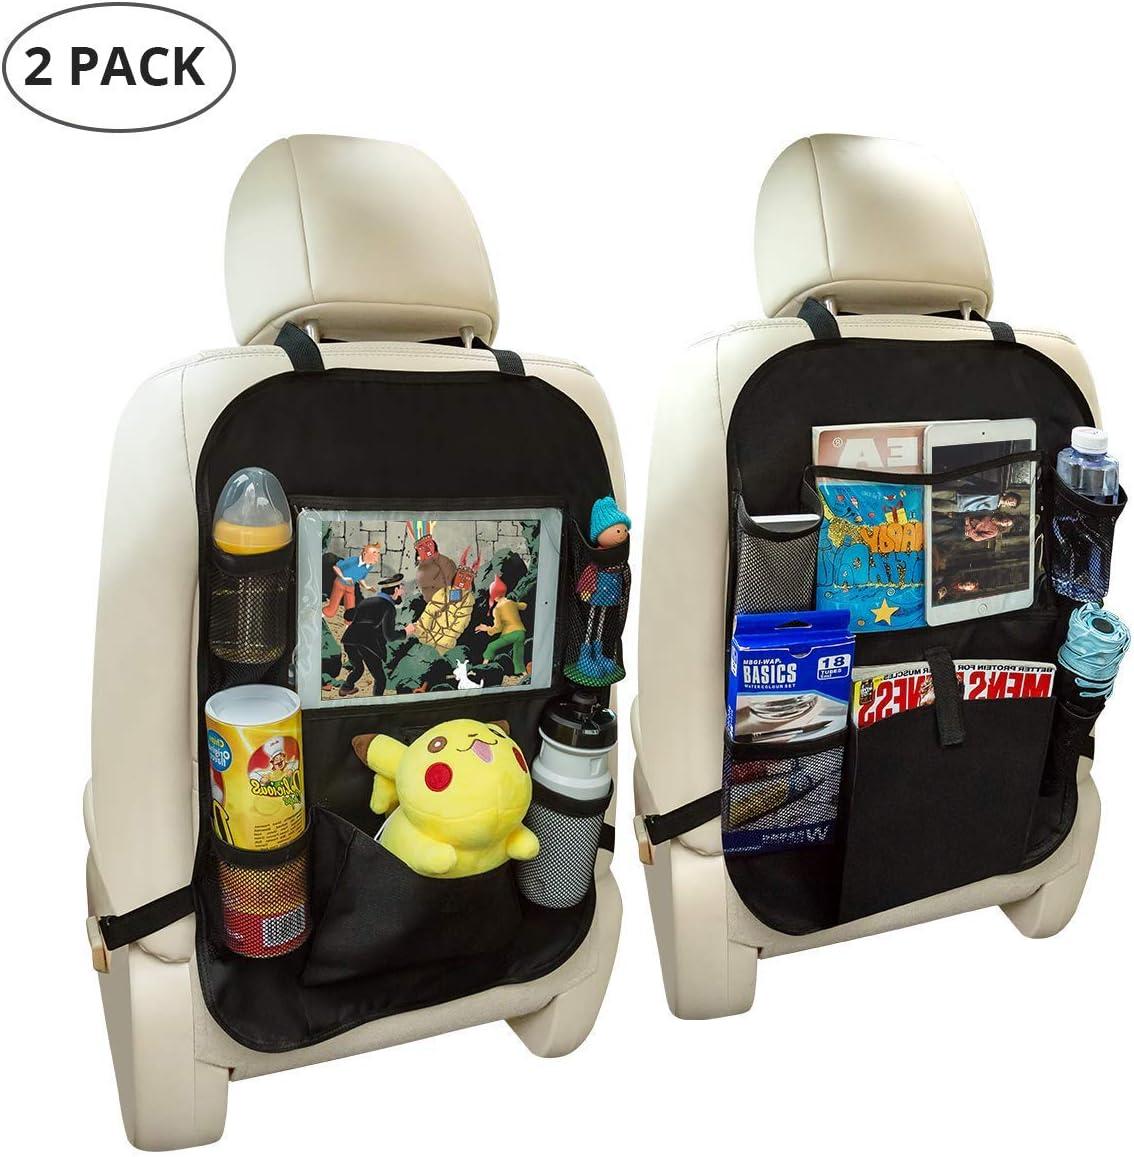 Basics Car Seat Back Protector with Organizer